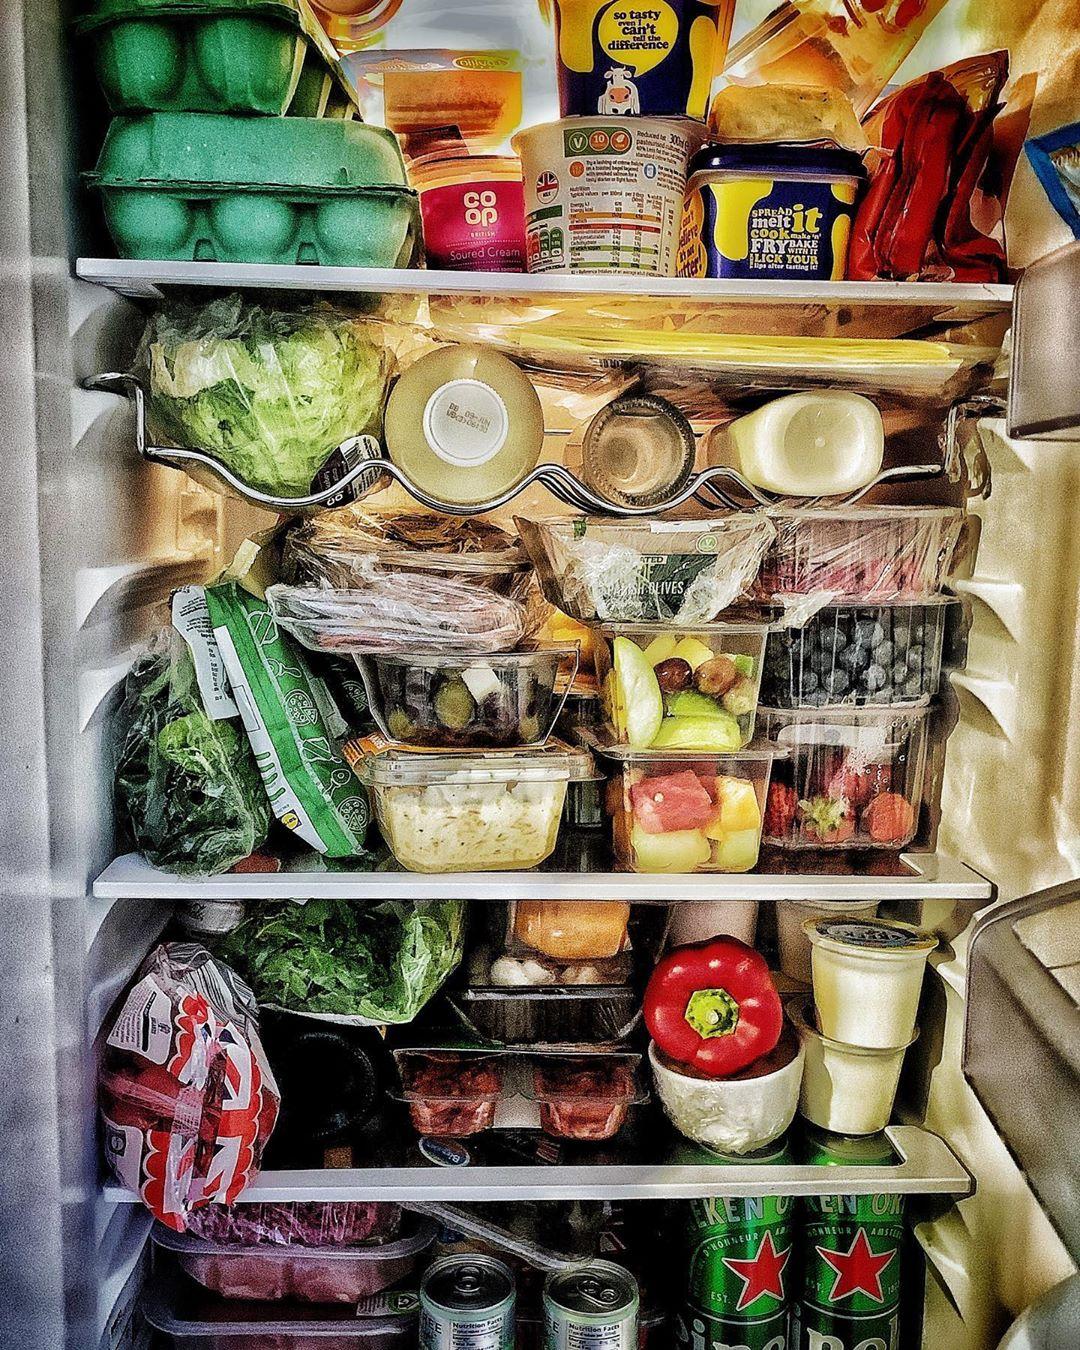 overpacked fridge